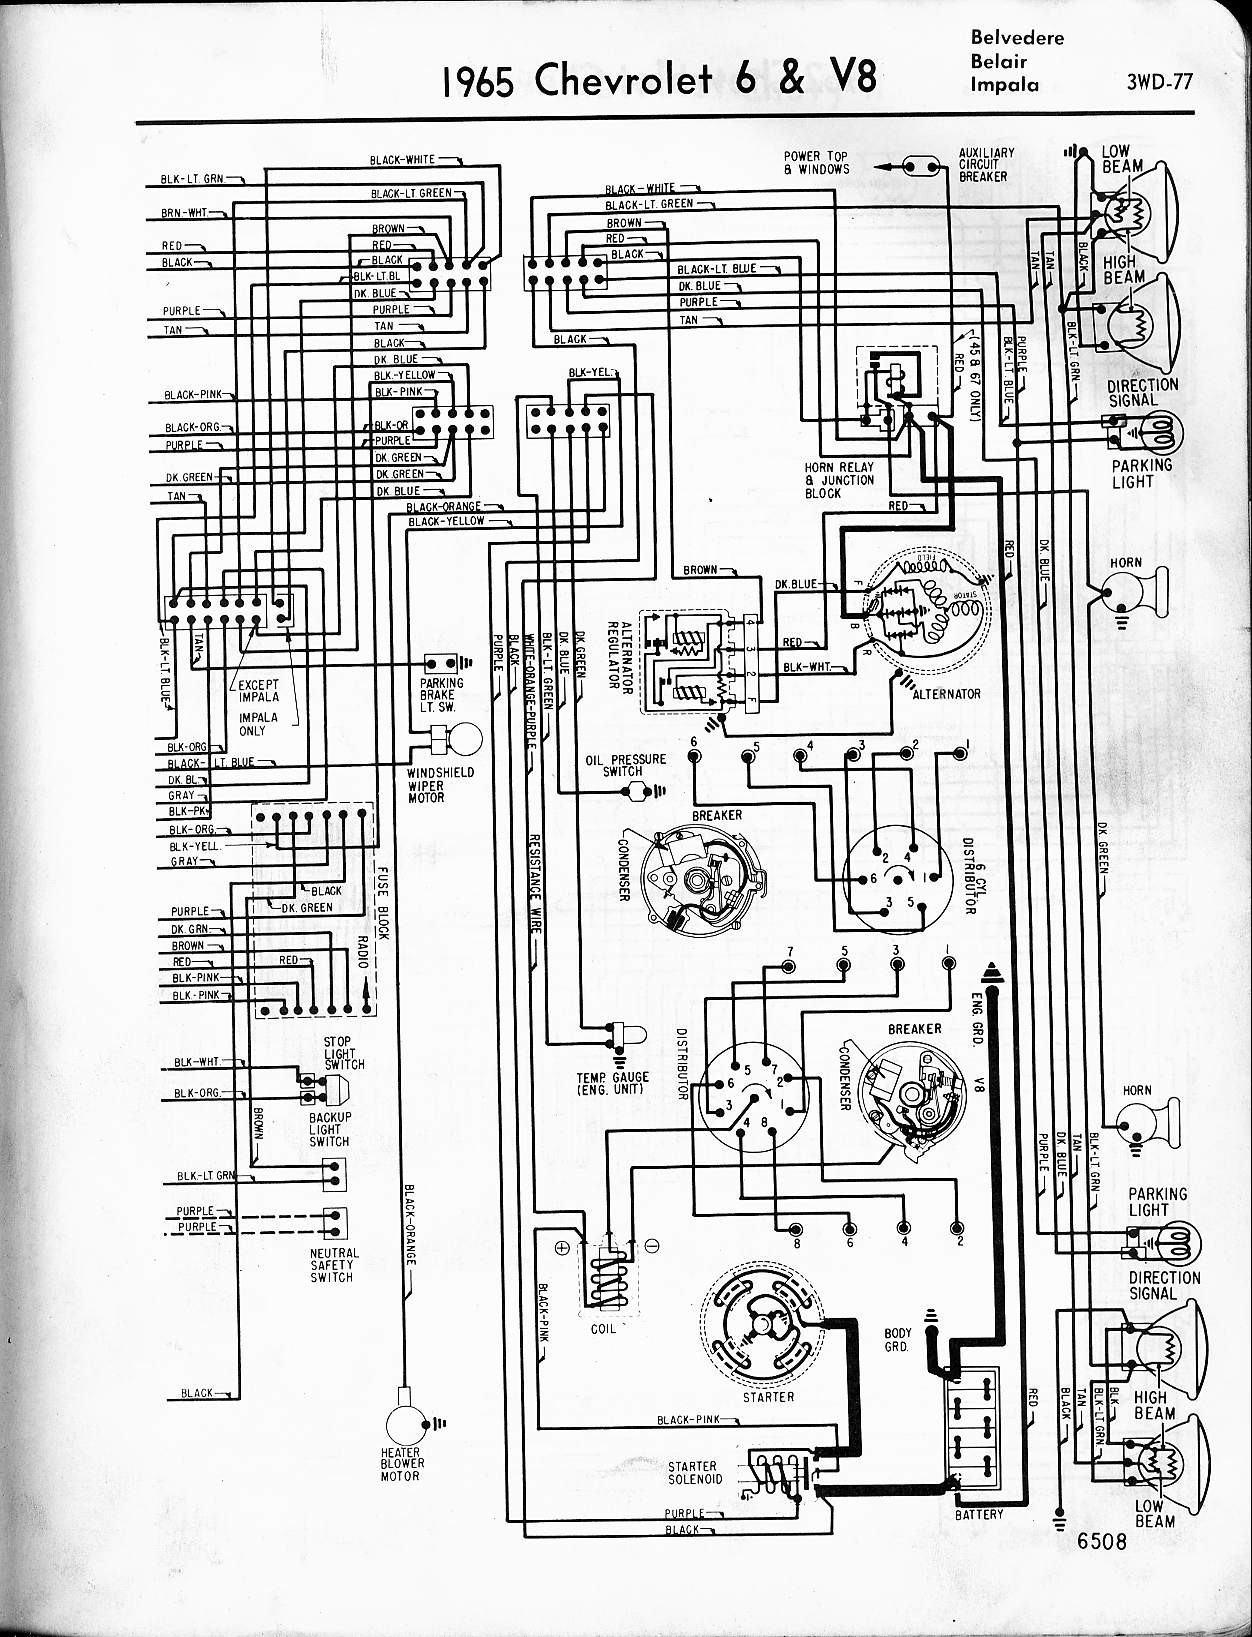 1964 chevy truck color wiring diagram square d 3 phase motor starter 1966 c10 euiu ortholinc de 65 1965 schema rh 17 7 schwangerschafts frage alternator